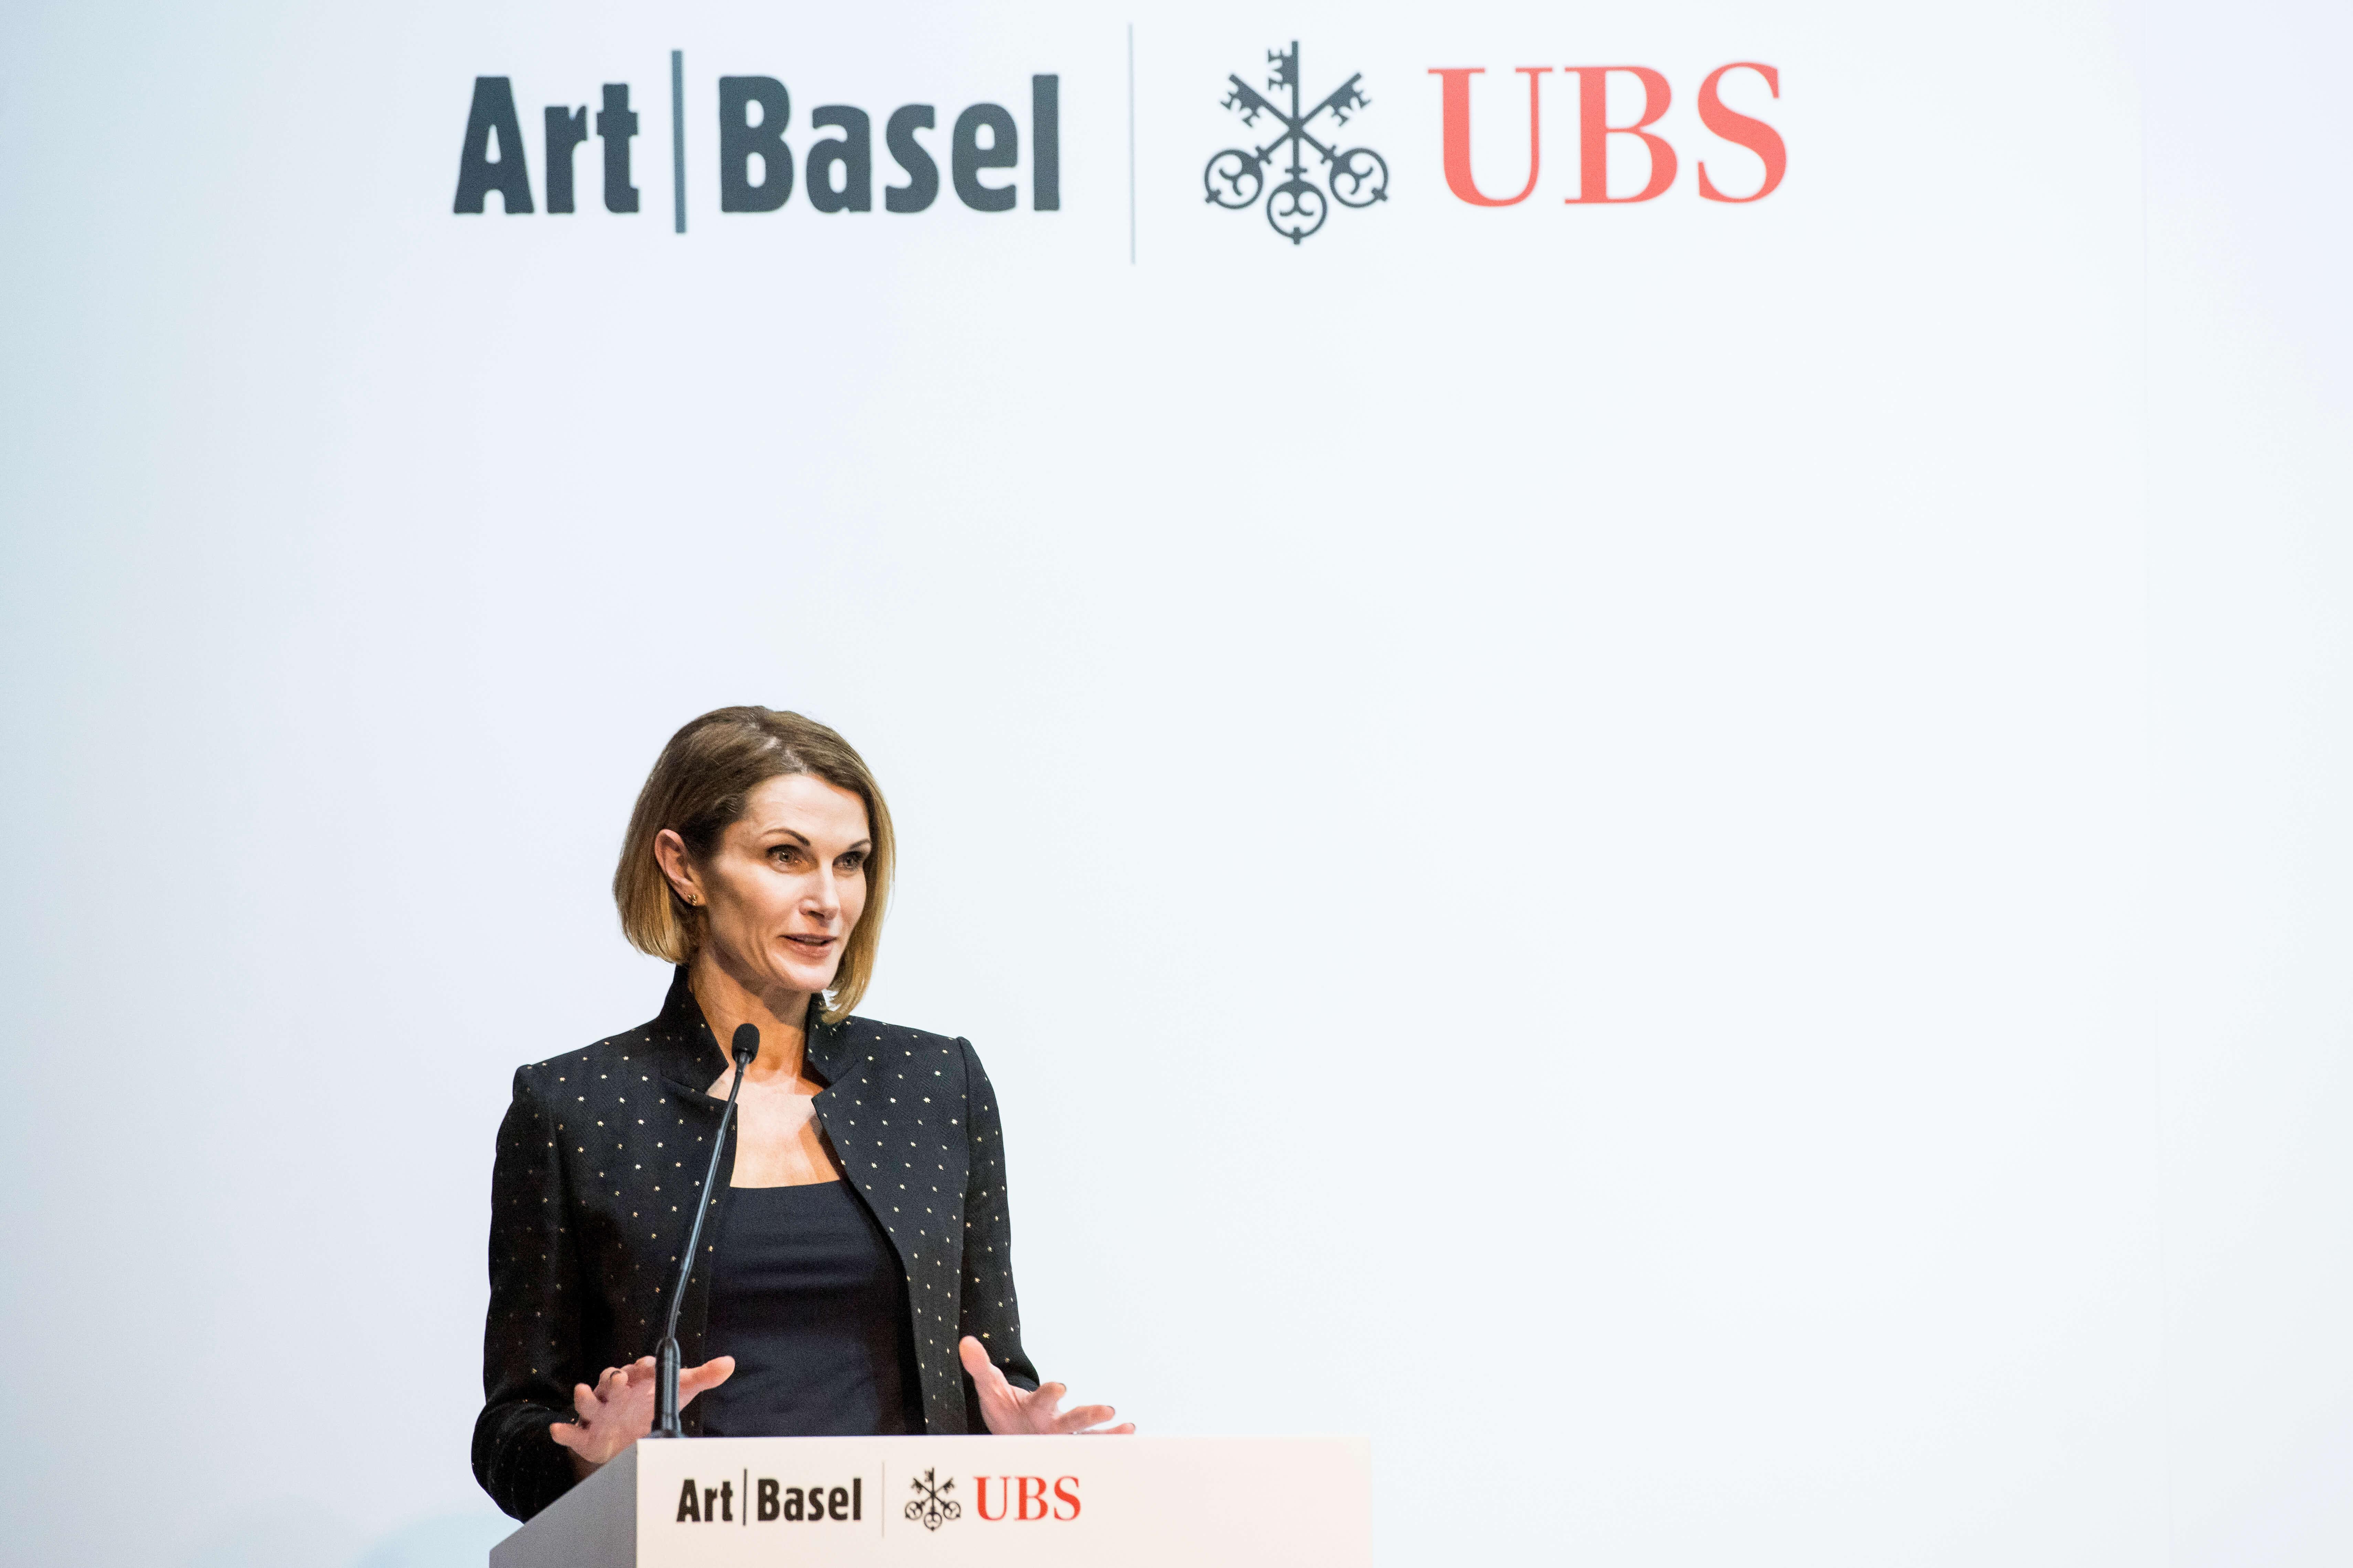 Rose Glen North Dakota ⁓ Try These Ubs Basel Jobs